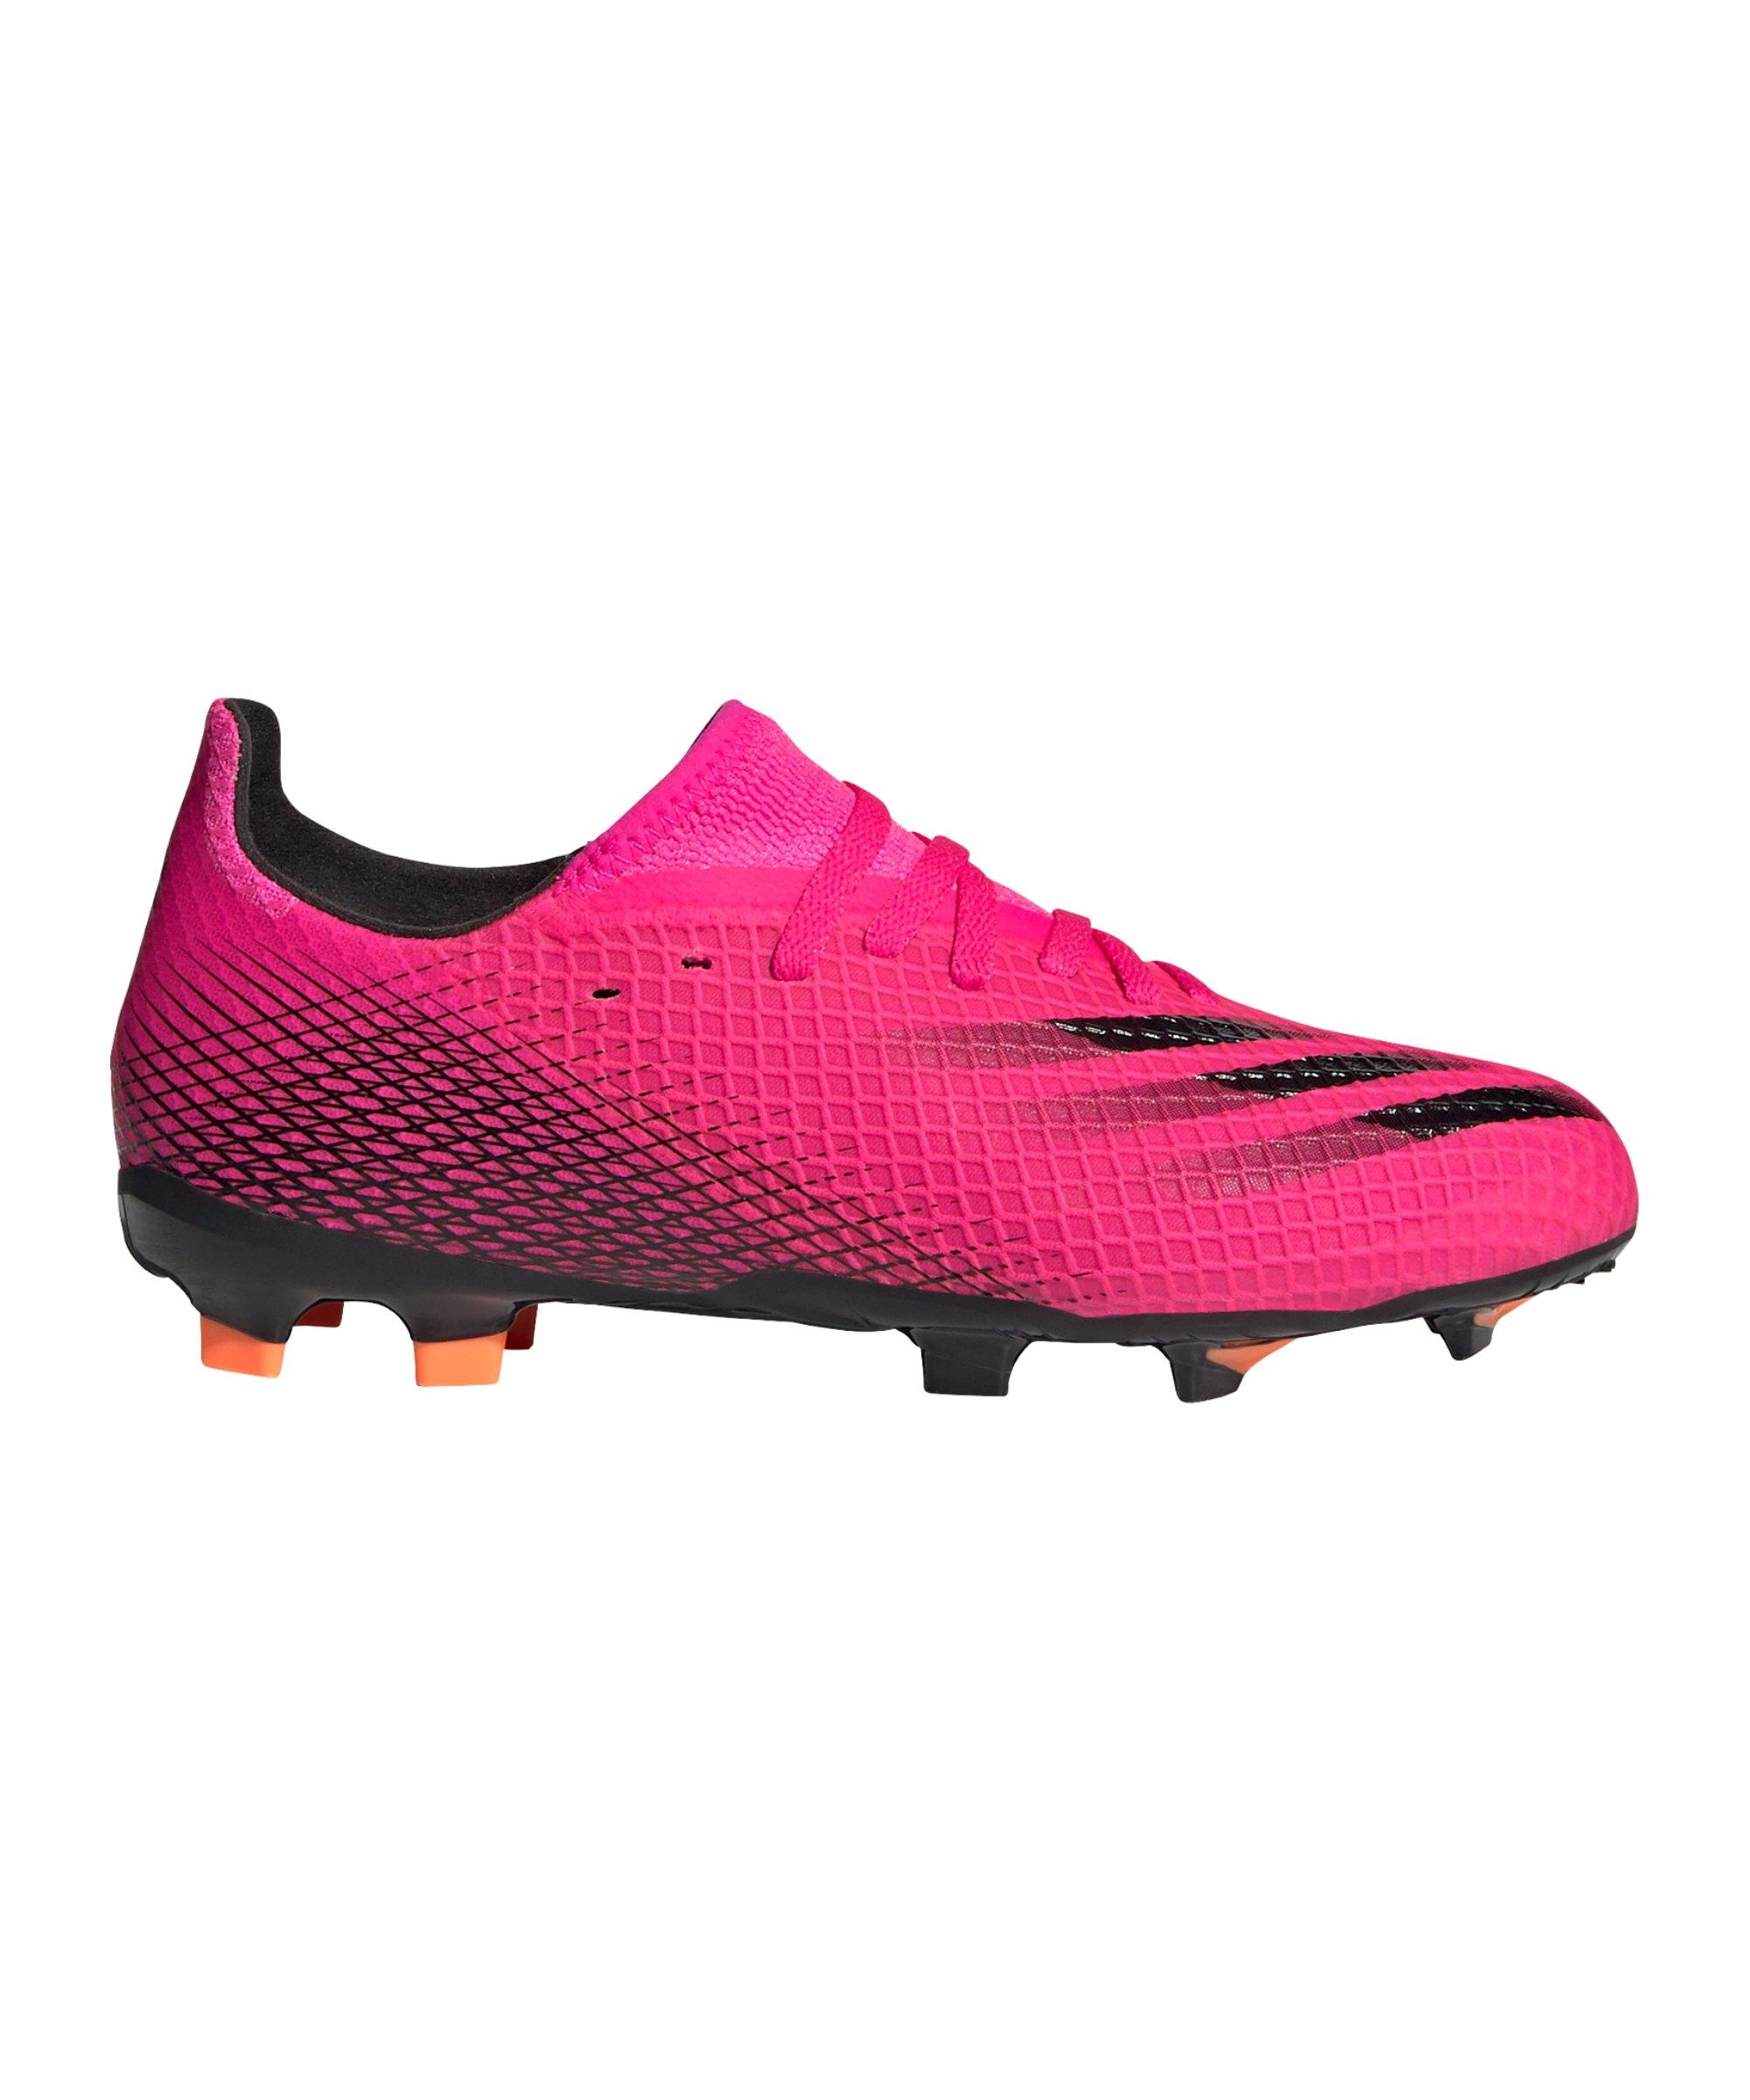 adidas X GHOSTED.3 FG J Kids Superspectral Pink Schwarz Orange - pink